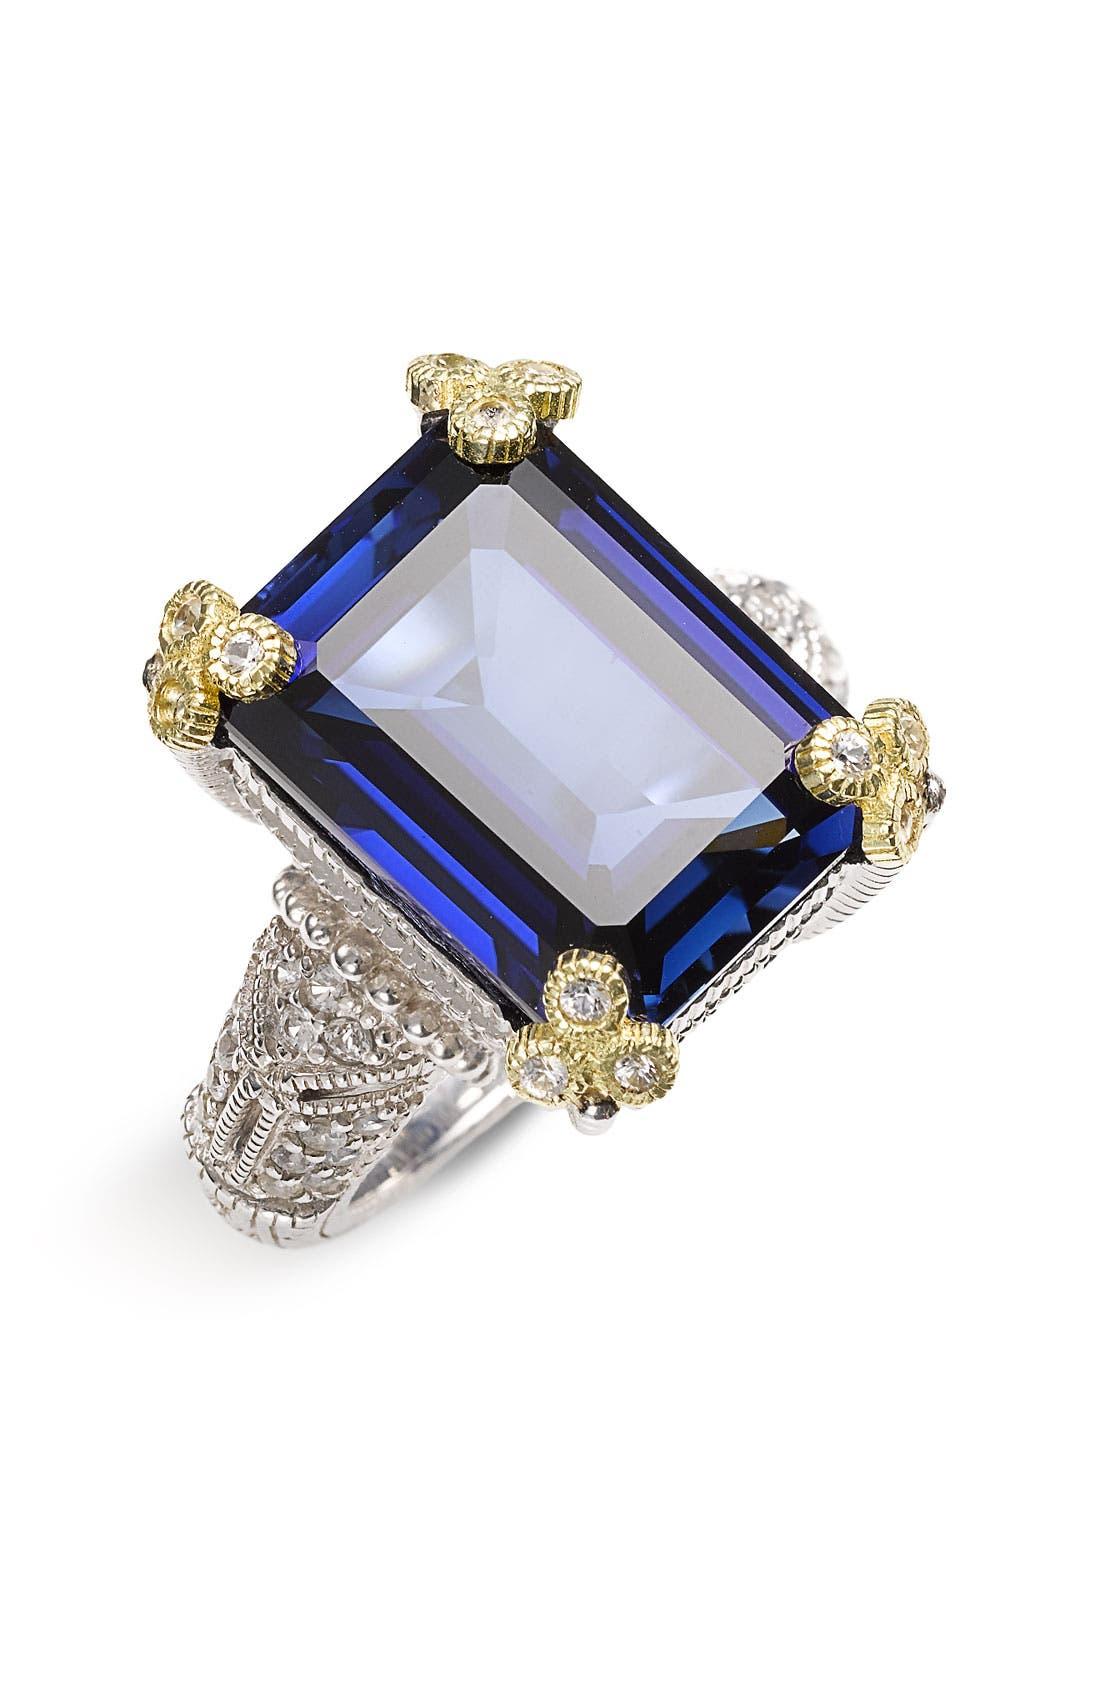 Alternate Image 1 Selected - Judith Ripka 'Estate' Emerald Cut Stone Ring